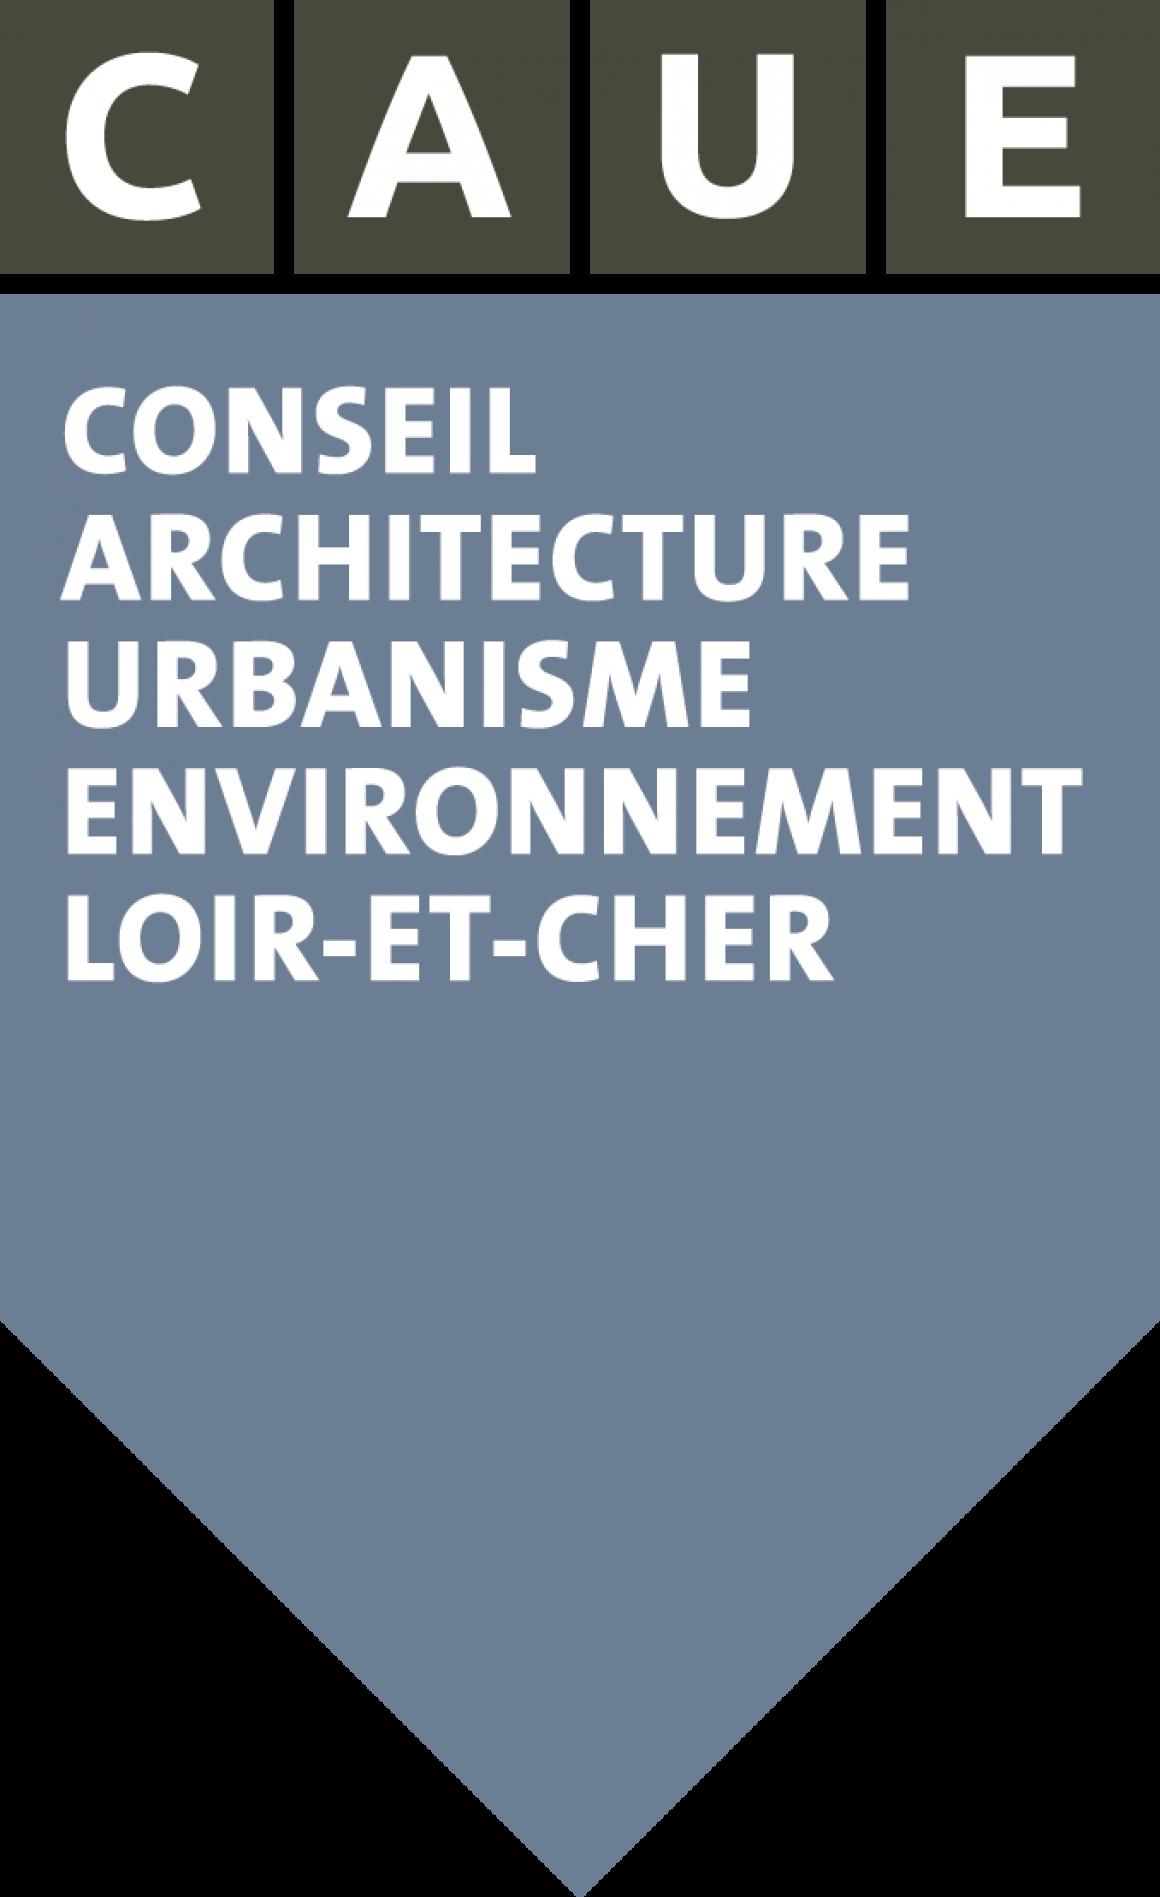 CAUE 41 Logo